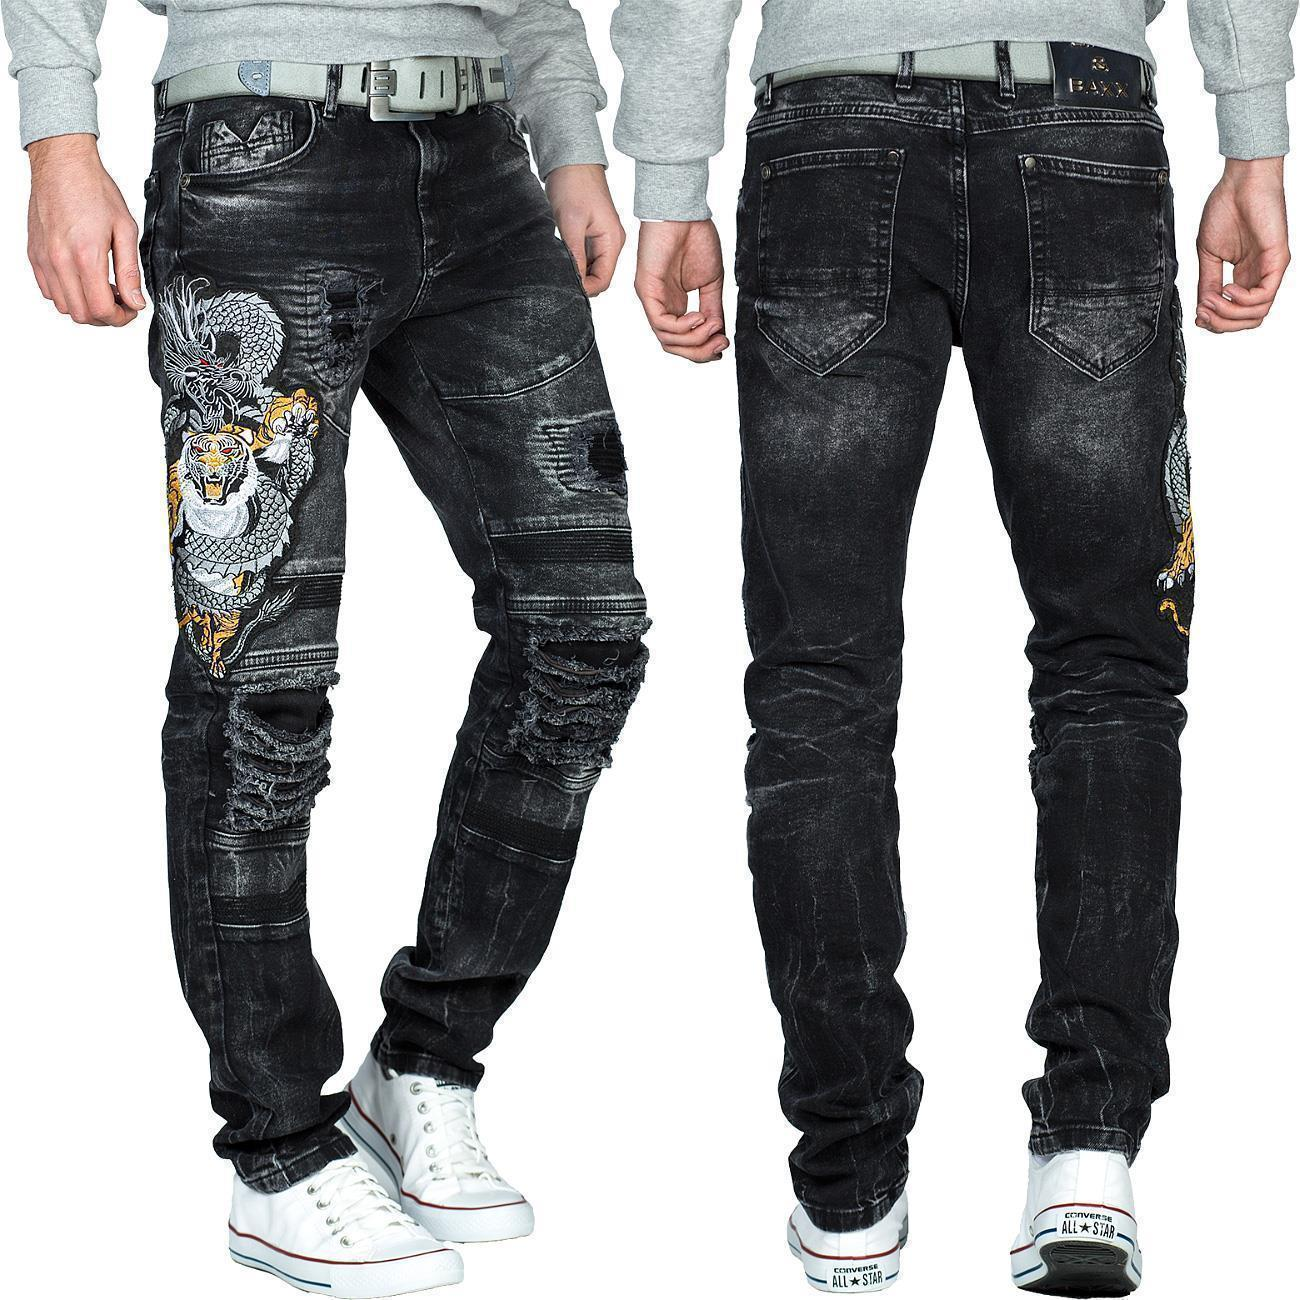 Cipo-amp-Baxx-Uomo-Jeans-Pantaloni-ricamate-Biker-Style-streetwear-nervature-pattern-Dope miniatura 2